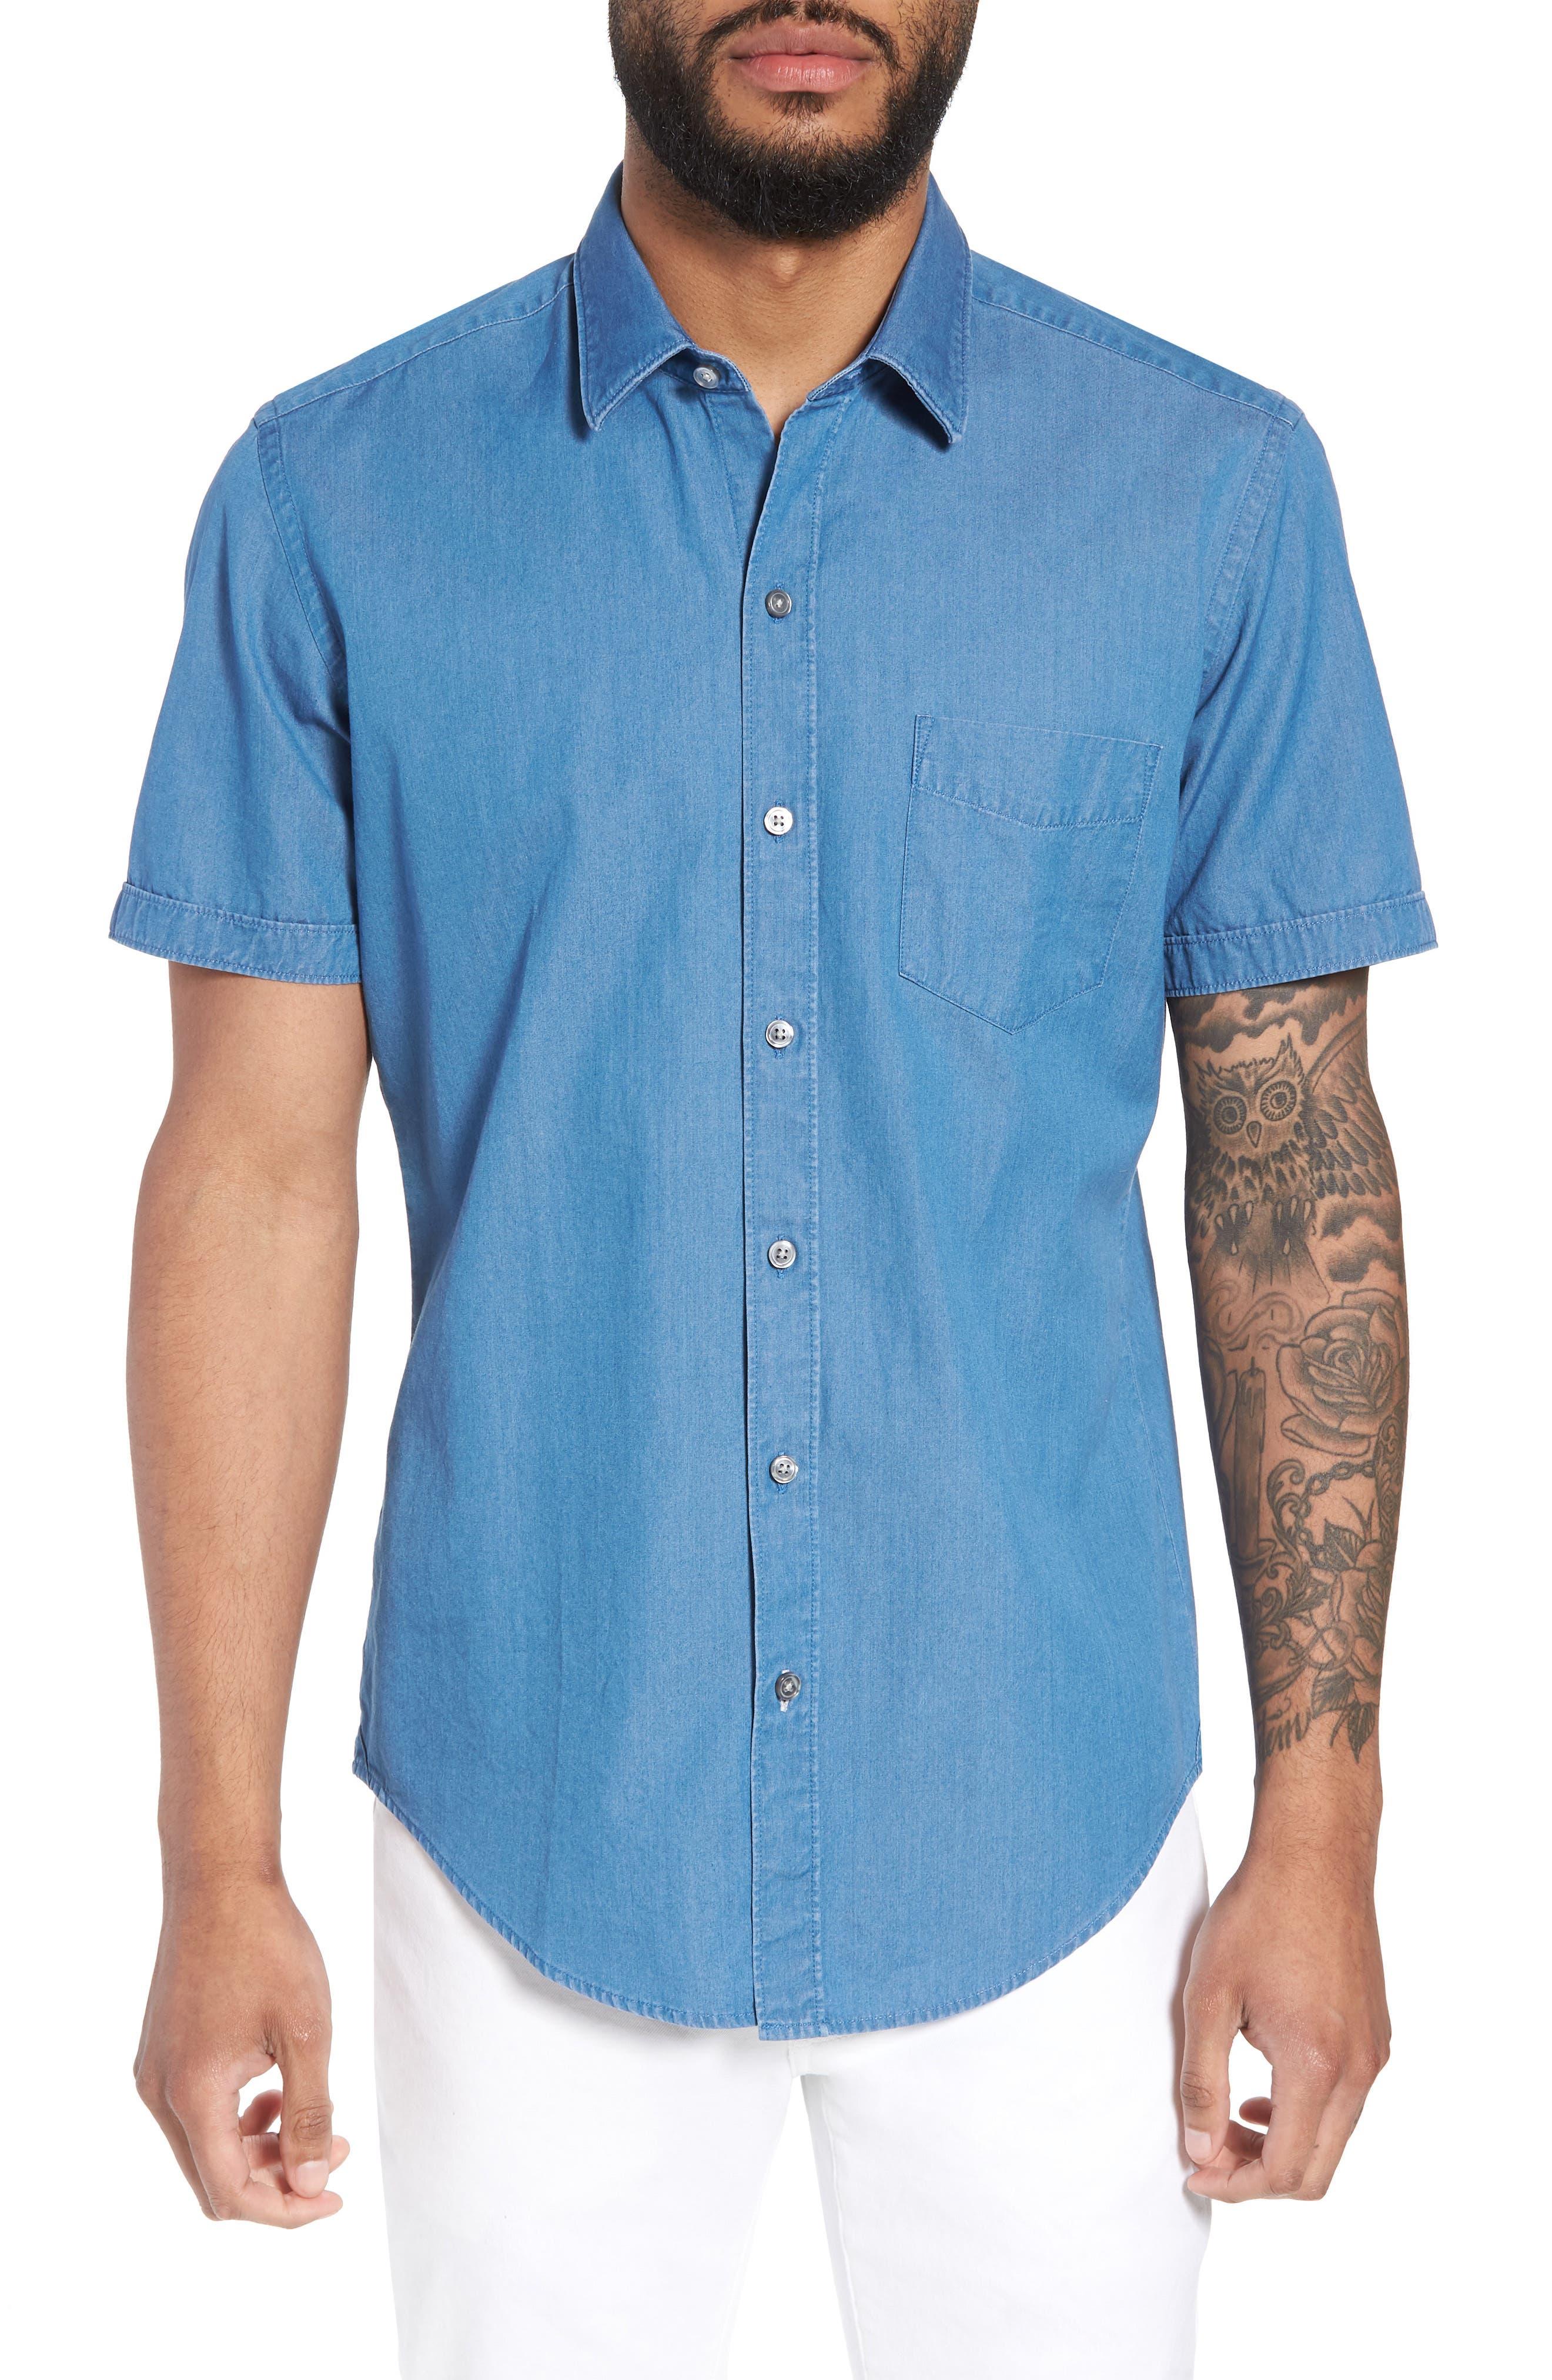 Robb Trim Fit Denim Short Sleeve Sport Shirt,                         Main,                         color, Blue